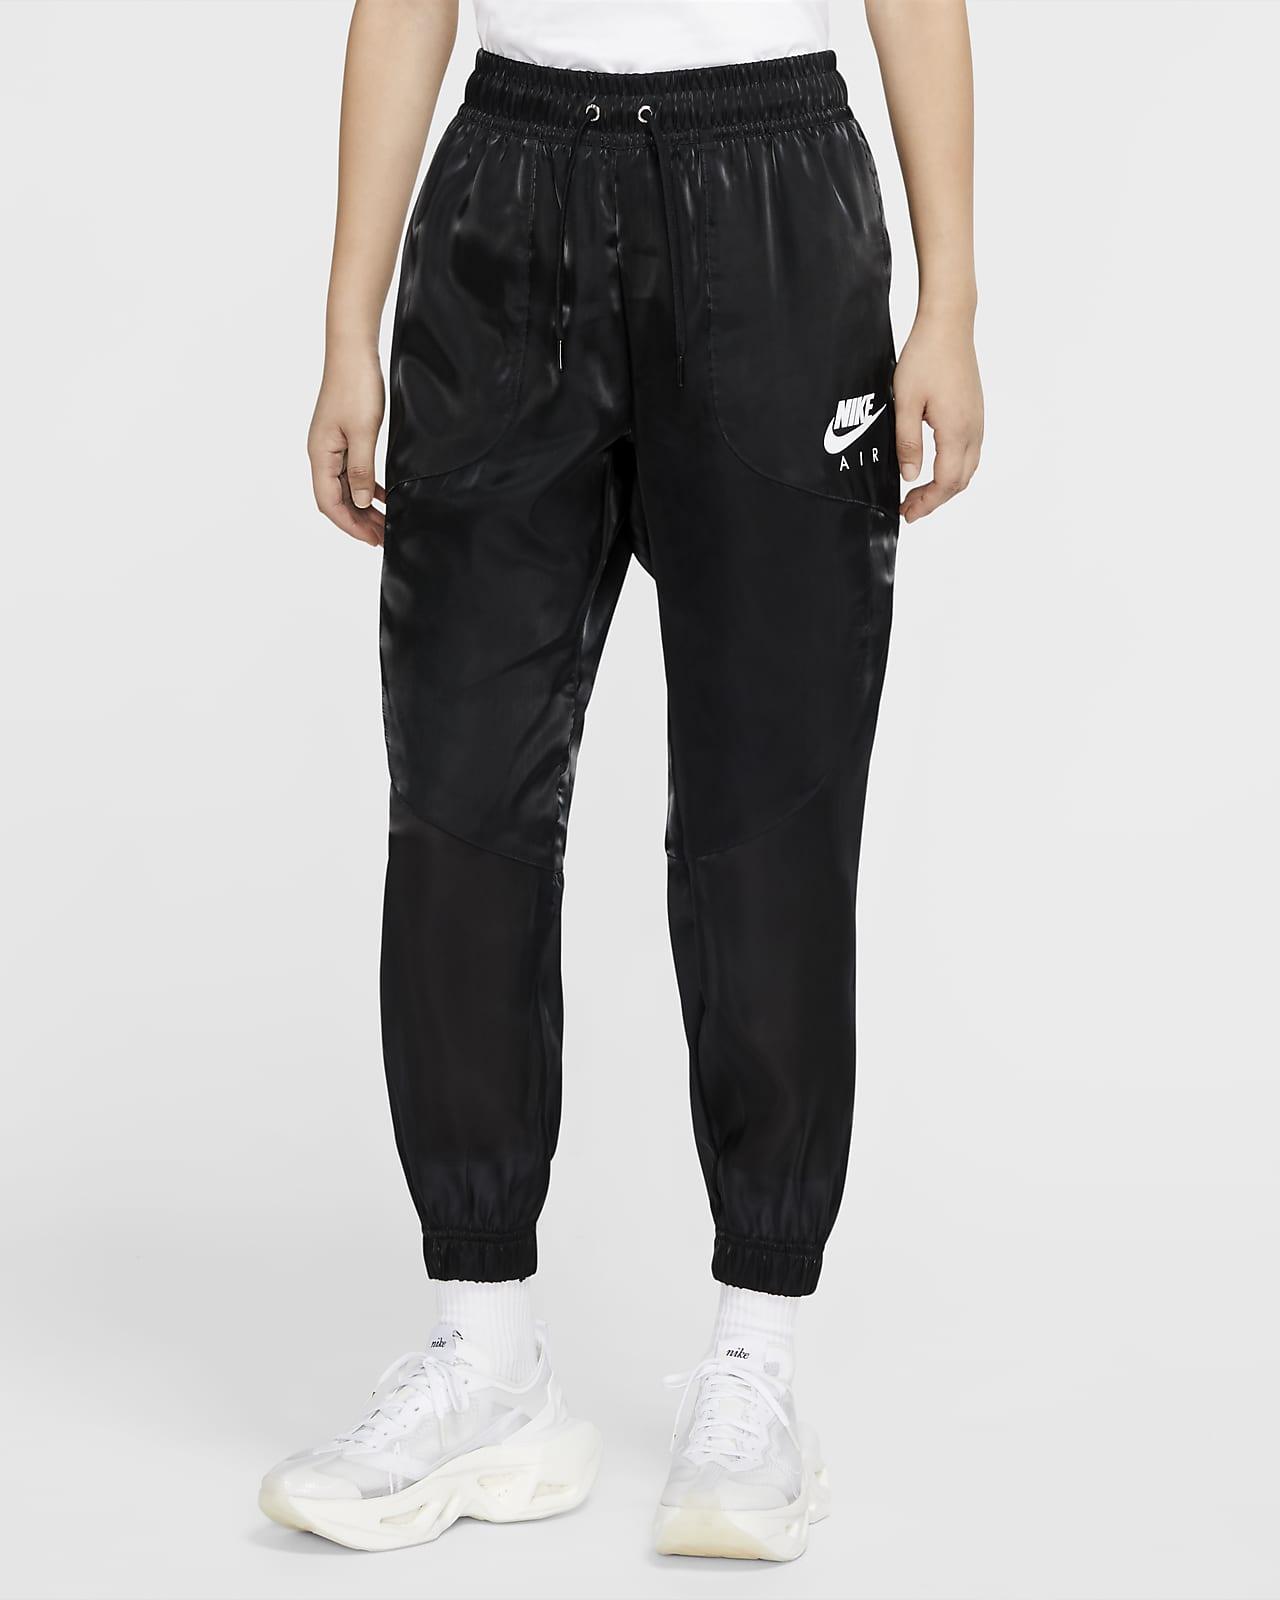 Pantalones Para Mujer Nike Air Nike Pr